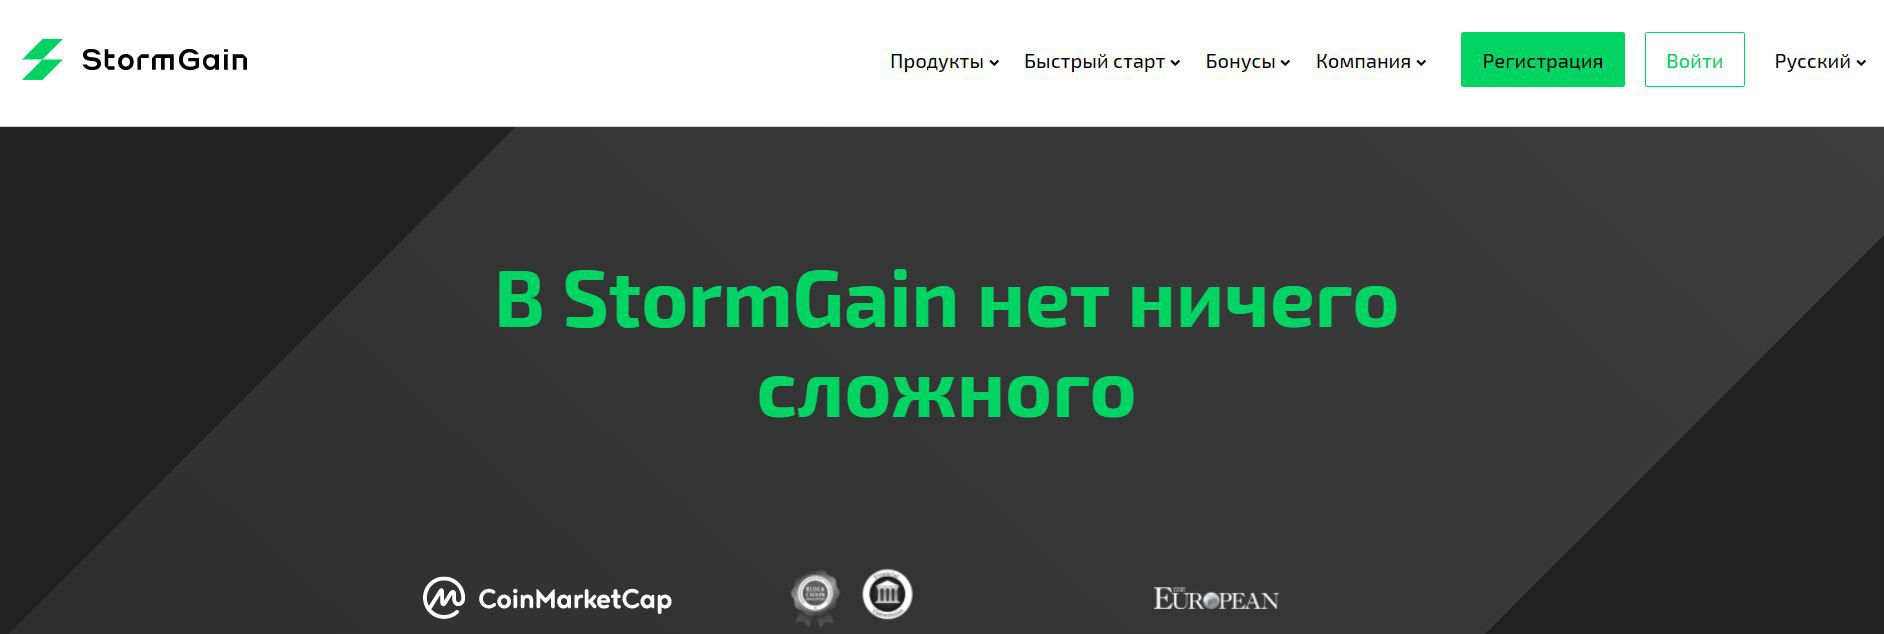 Главная страница StormGain